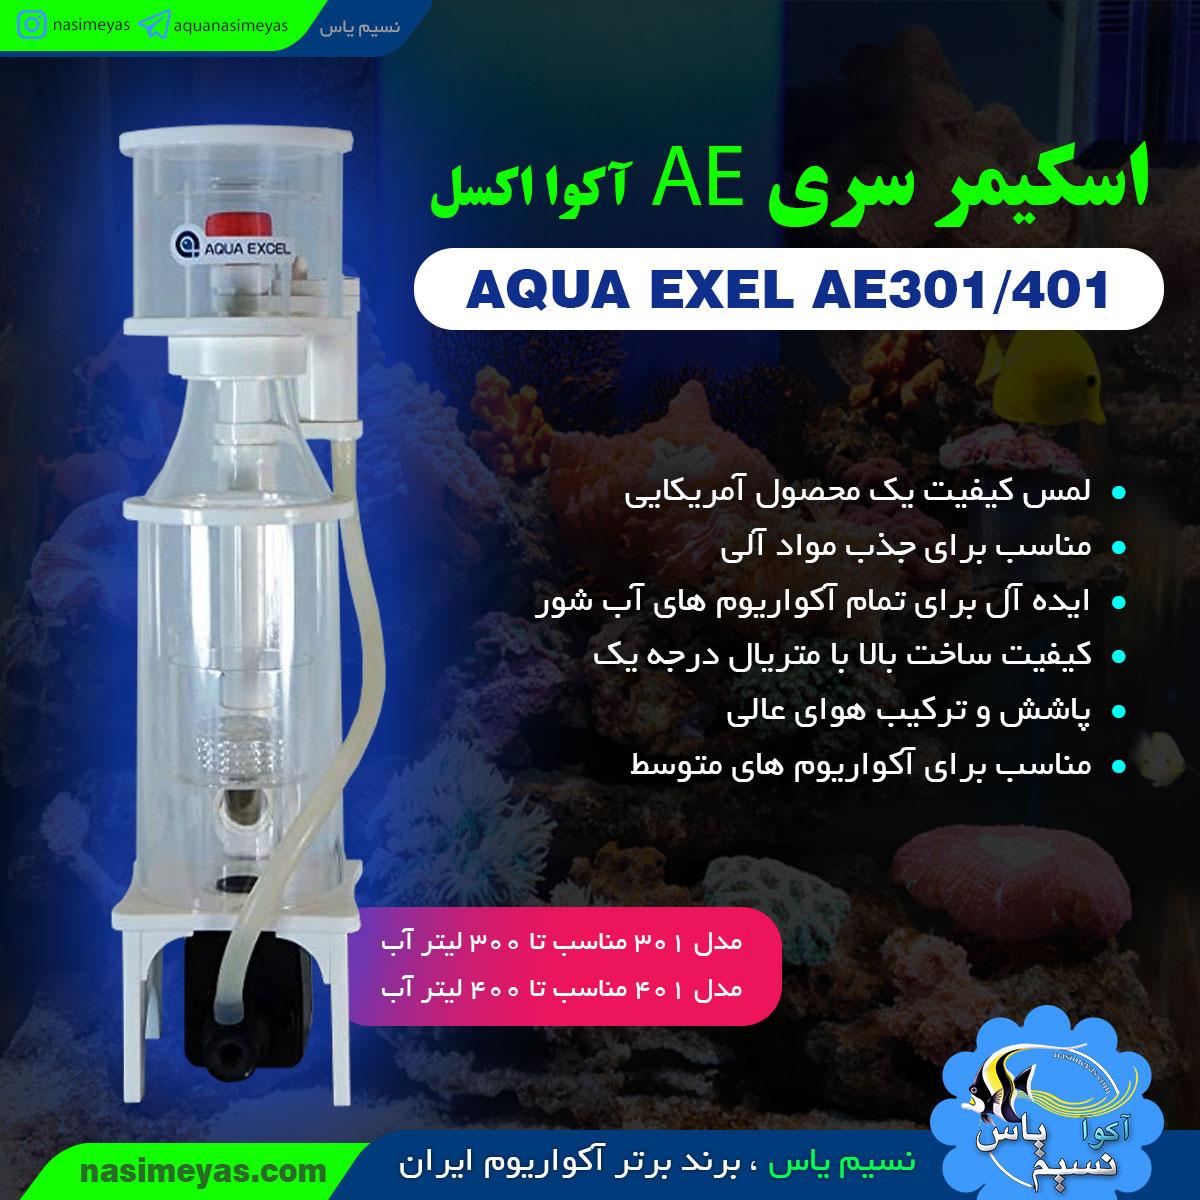 Aqua exel ae-301